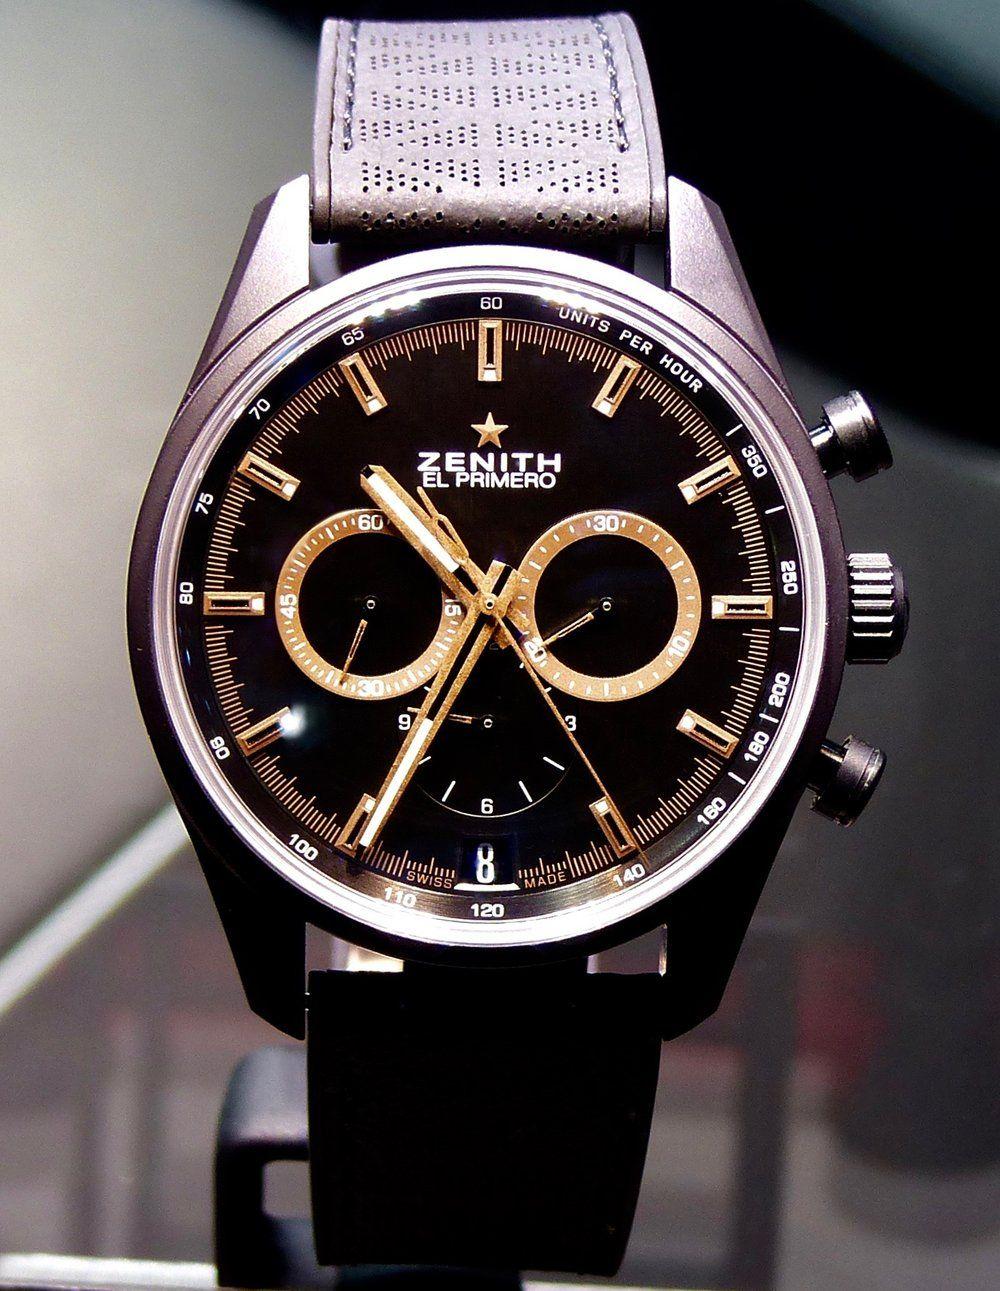 08960d0692f ZENITH   LAND ROVER « CHRONOMASTER EL PRIMERO RANGE ROVER VELAR Special  Edition » — w4watch